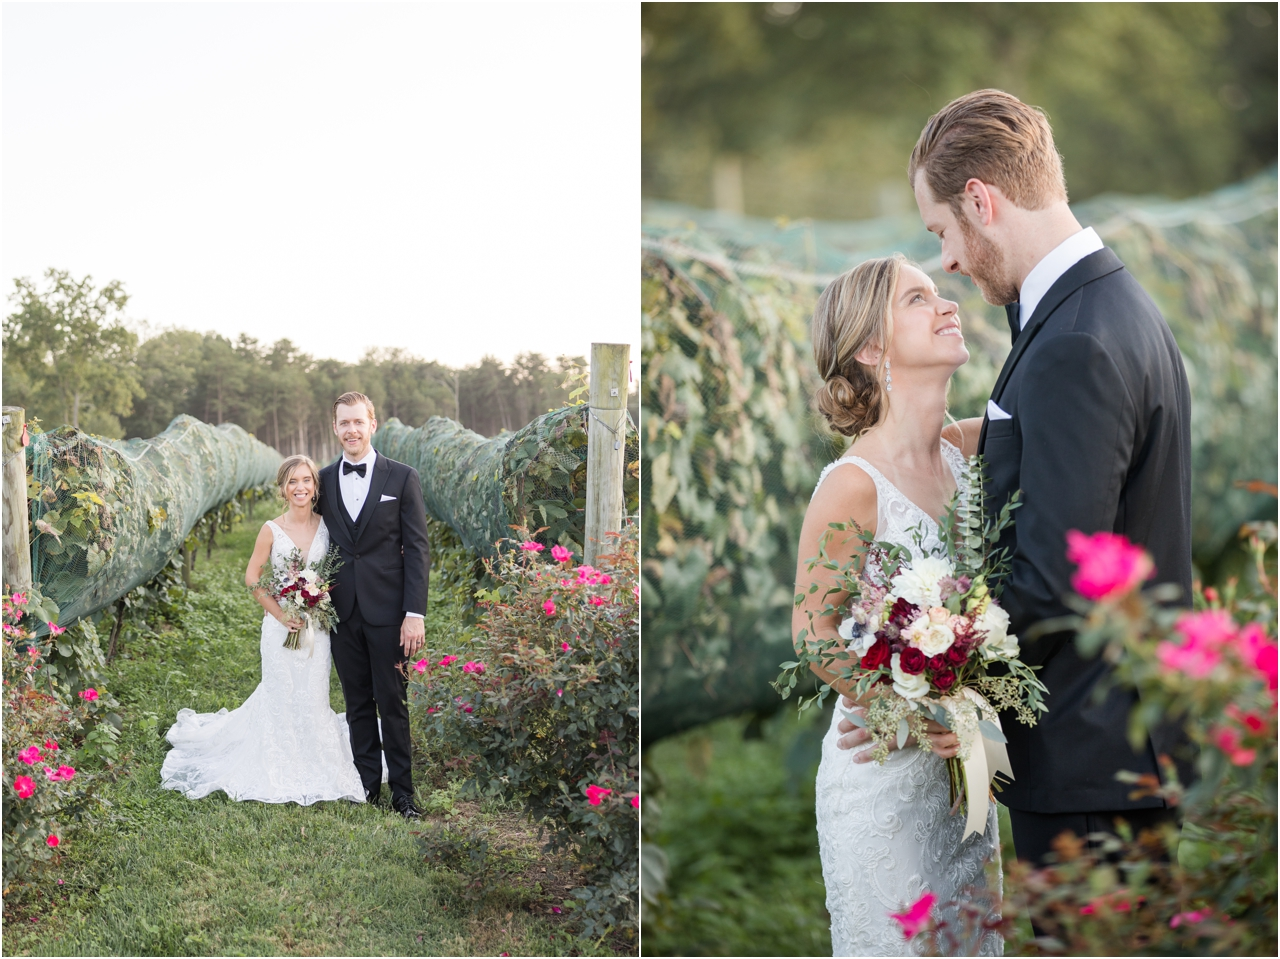 Bull_Run_Winery_Wedding_024